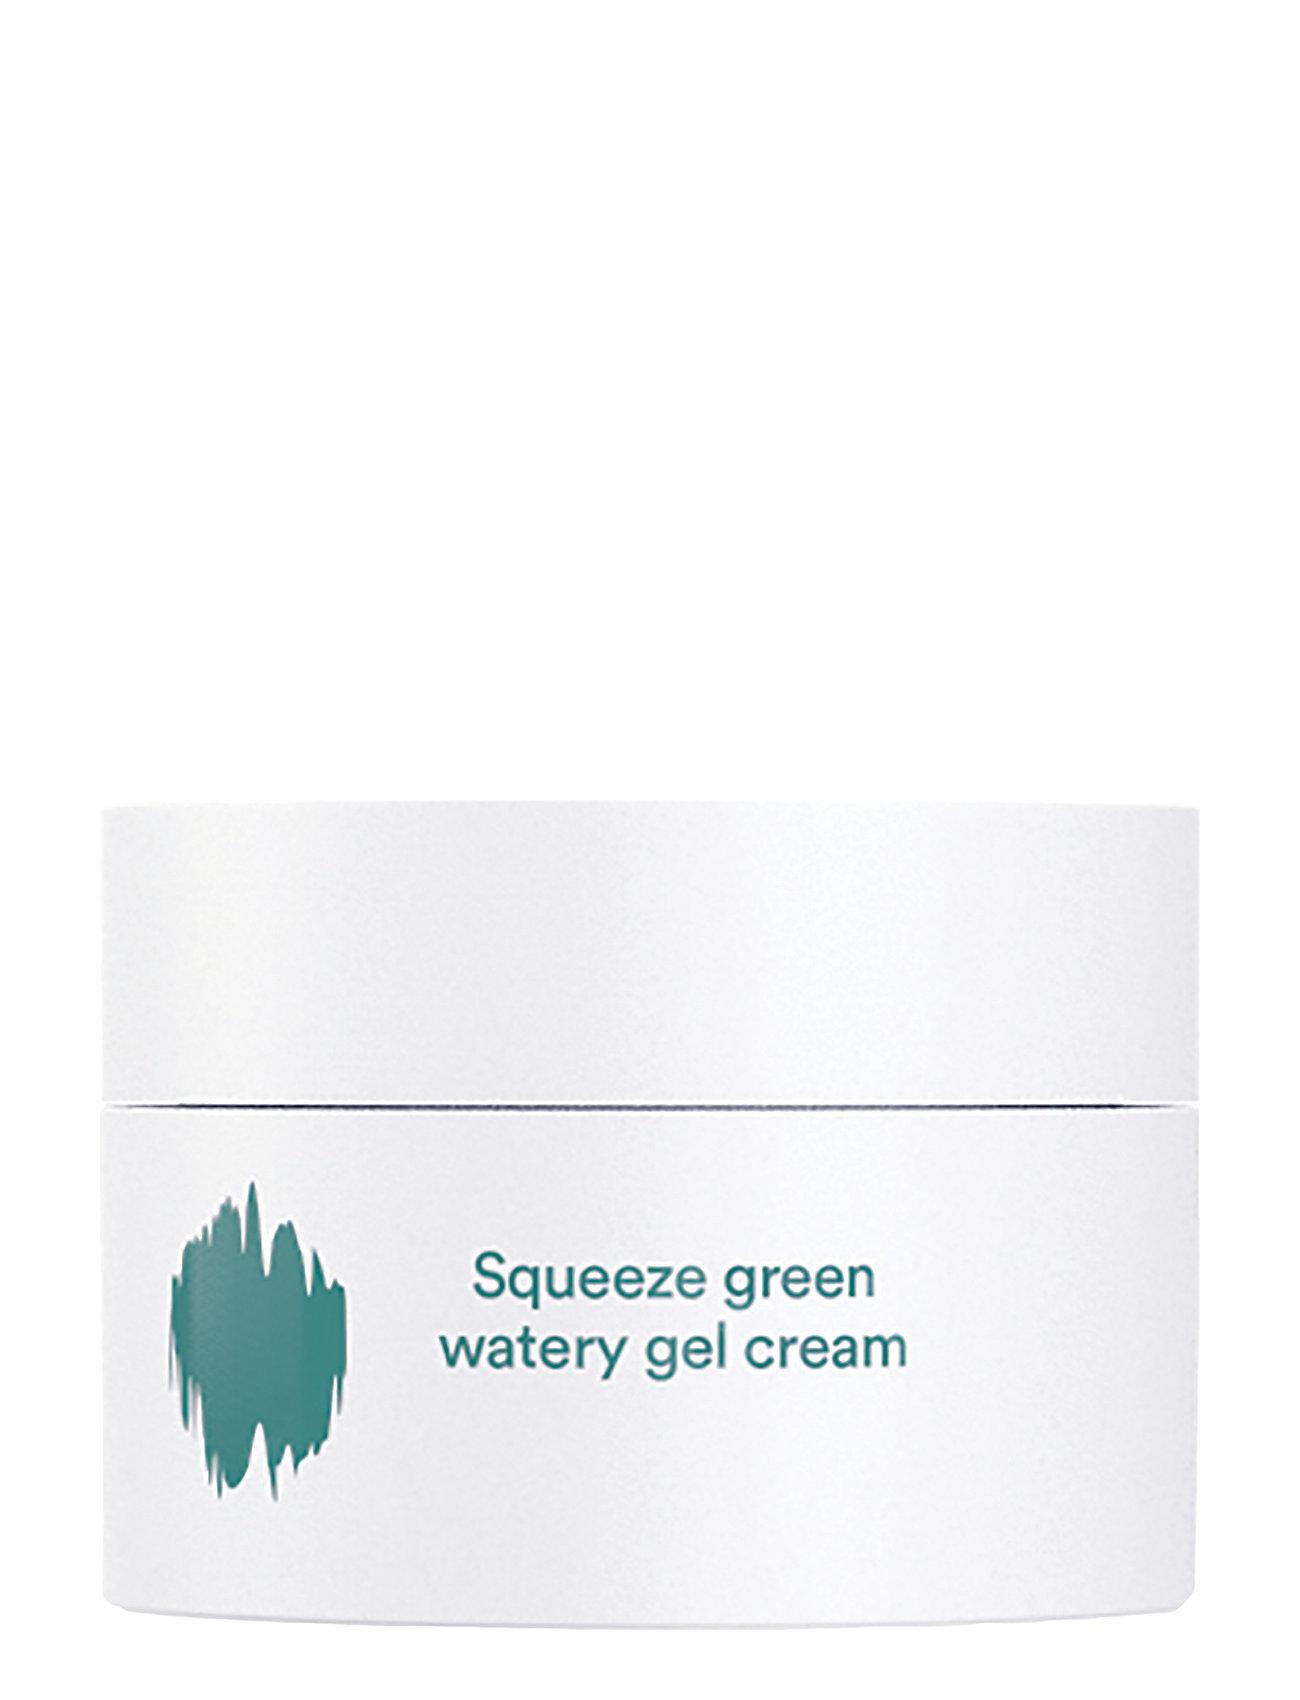 E NATURE E NATURE Squeeze green watery  Gel Cream - CLEAR